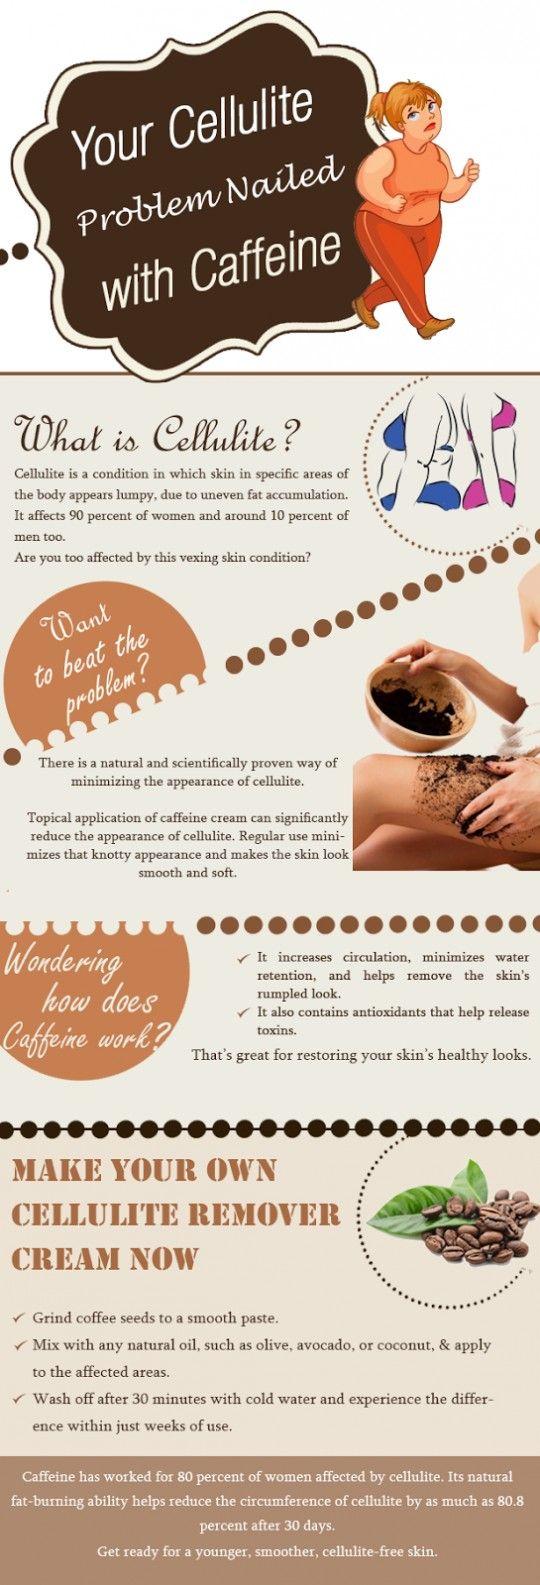 Non-Surgical Secrets To Getting Rid of Cellulite - LoseIT Tea